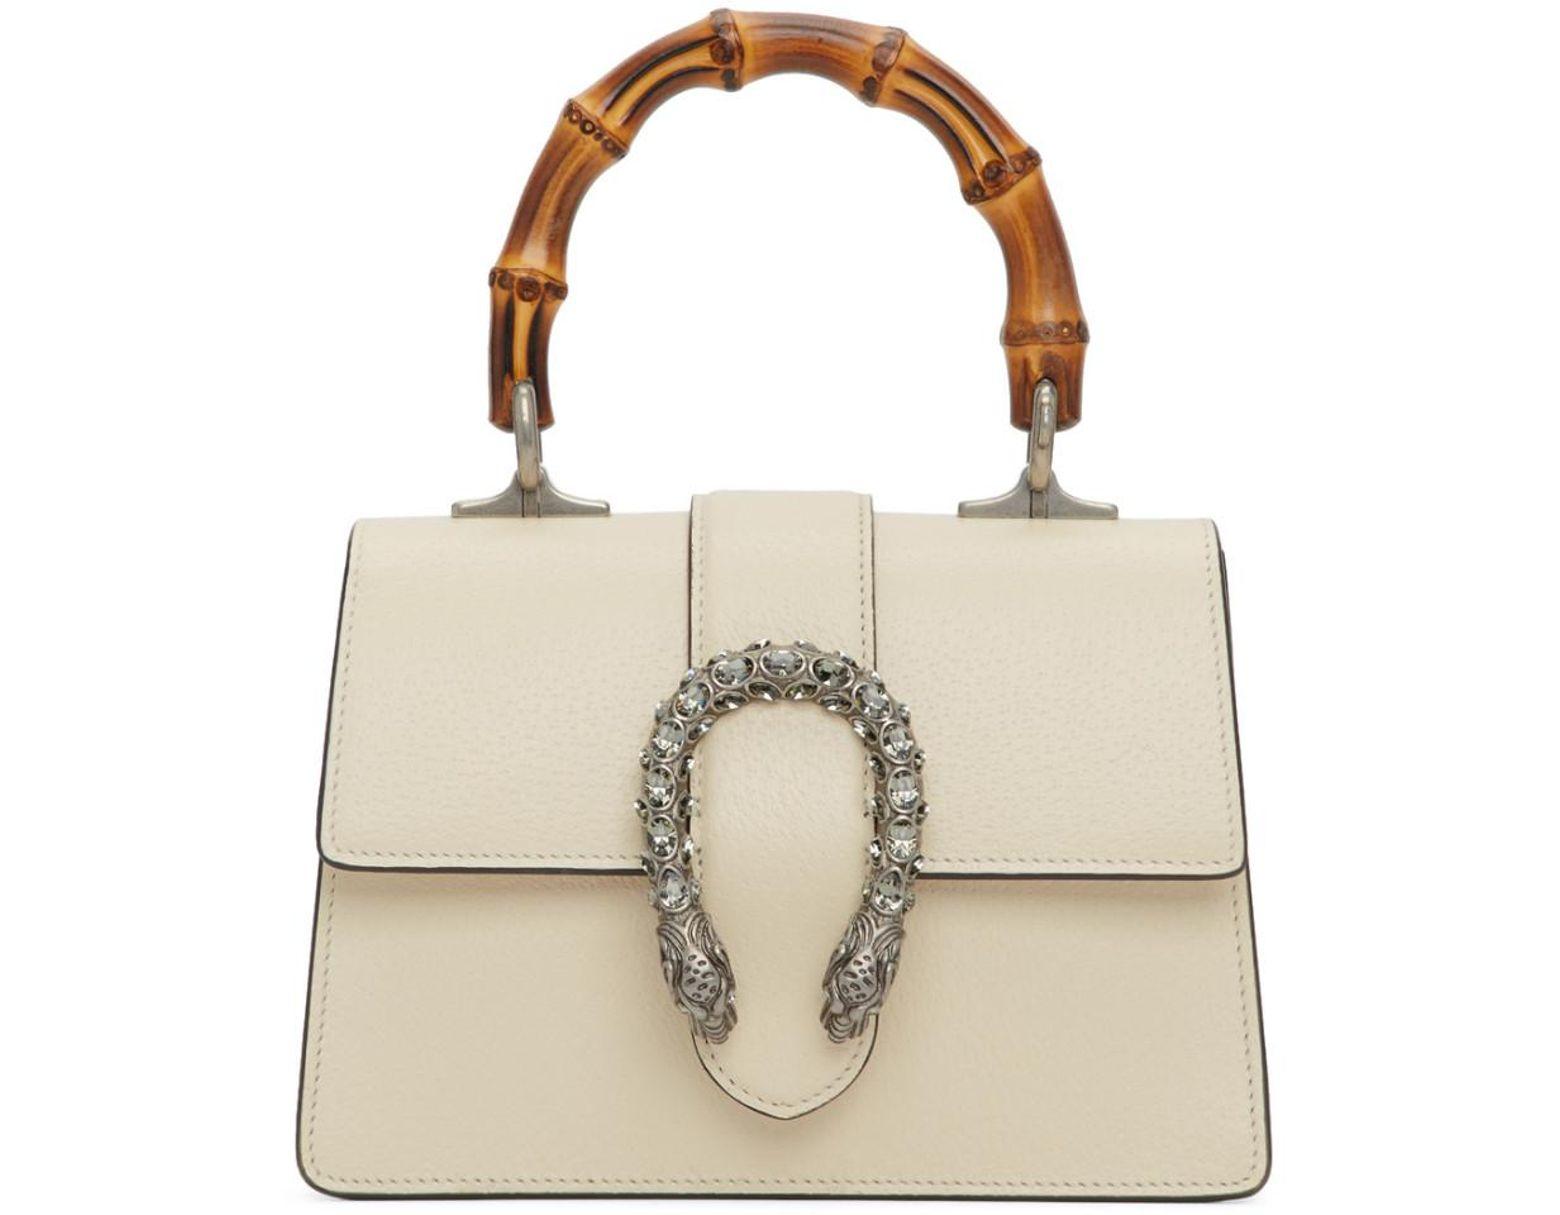 fd6bfca69185 Gucci White Mini Dionysus Top Handle Bag in White - Lyst